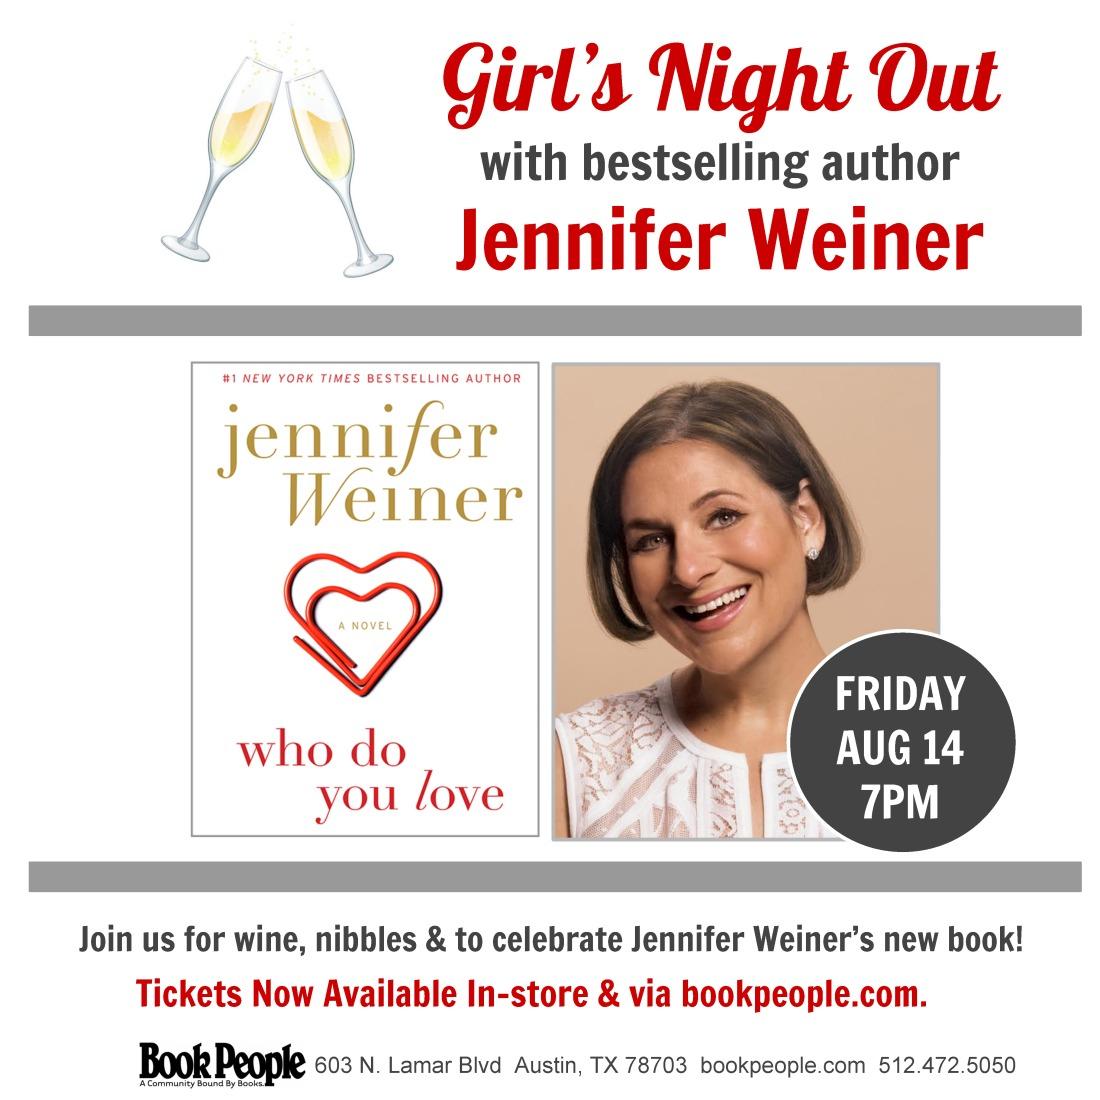 Jennifer Weiner social media square